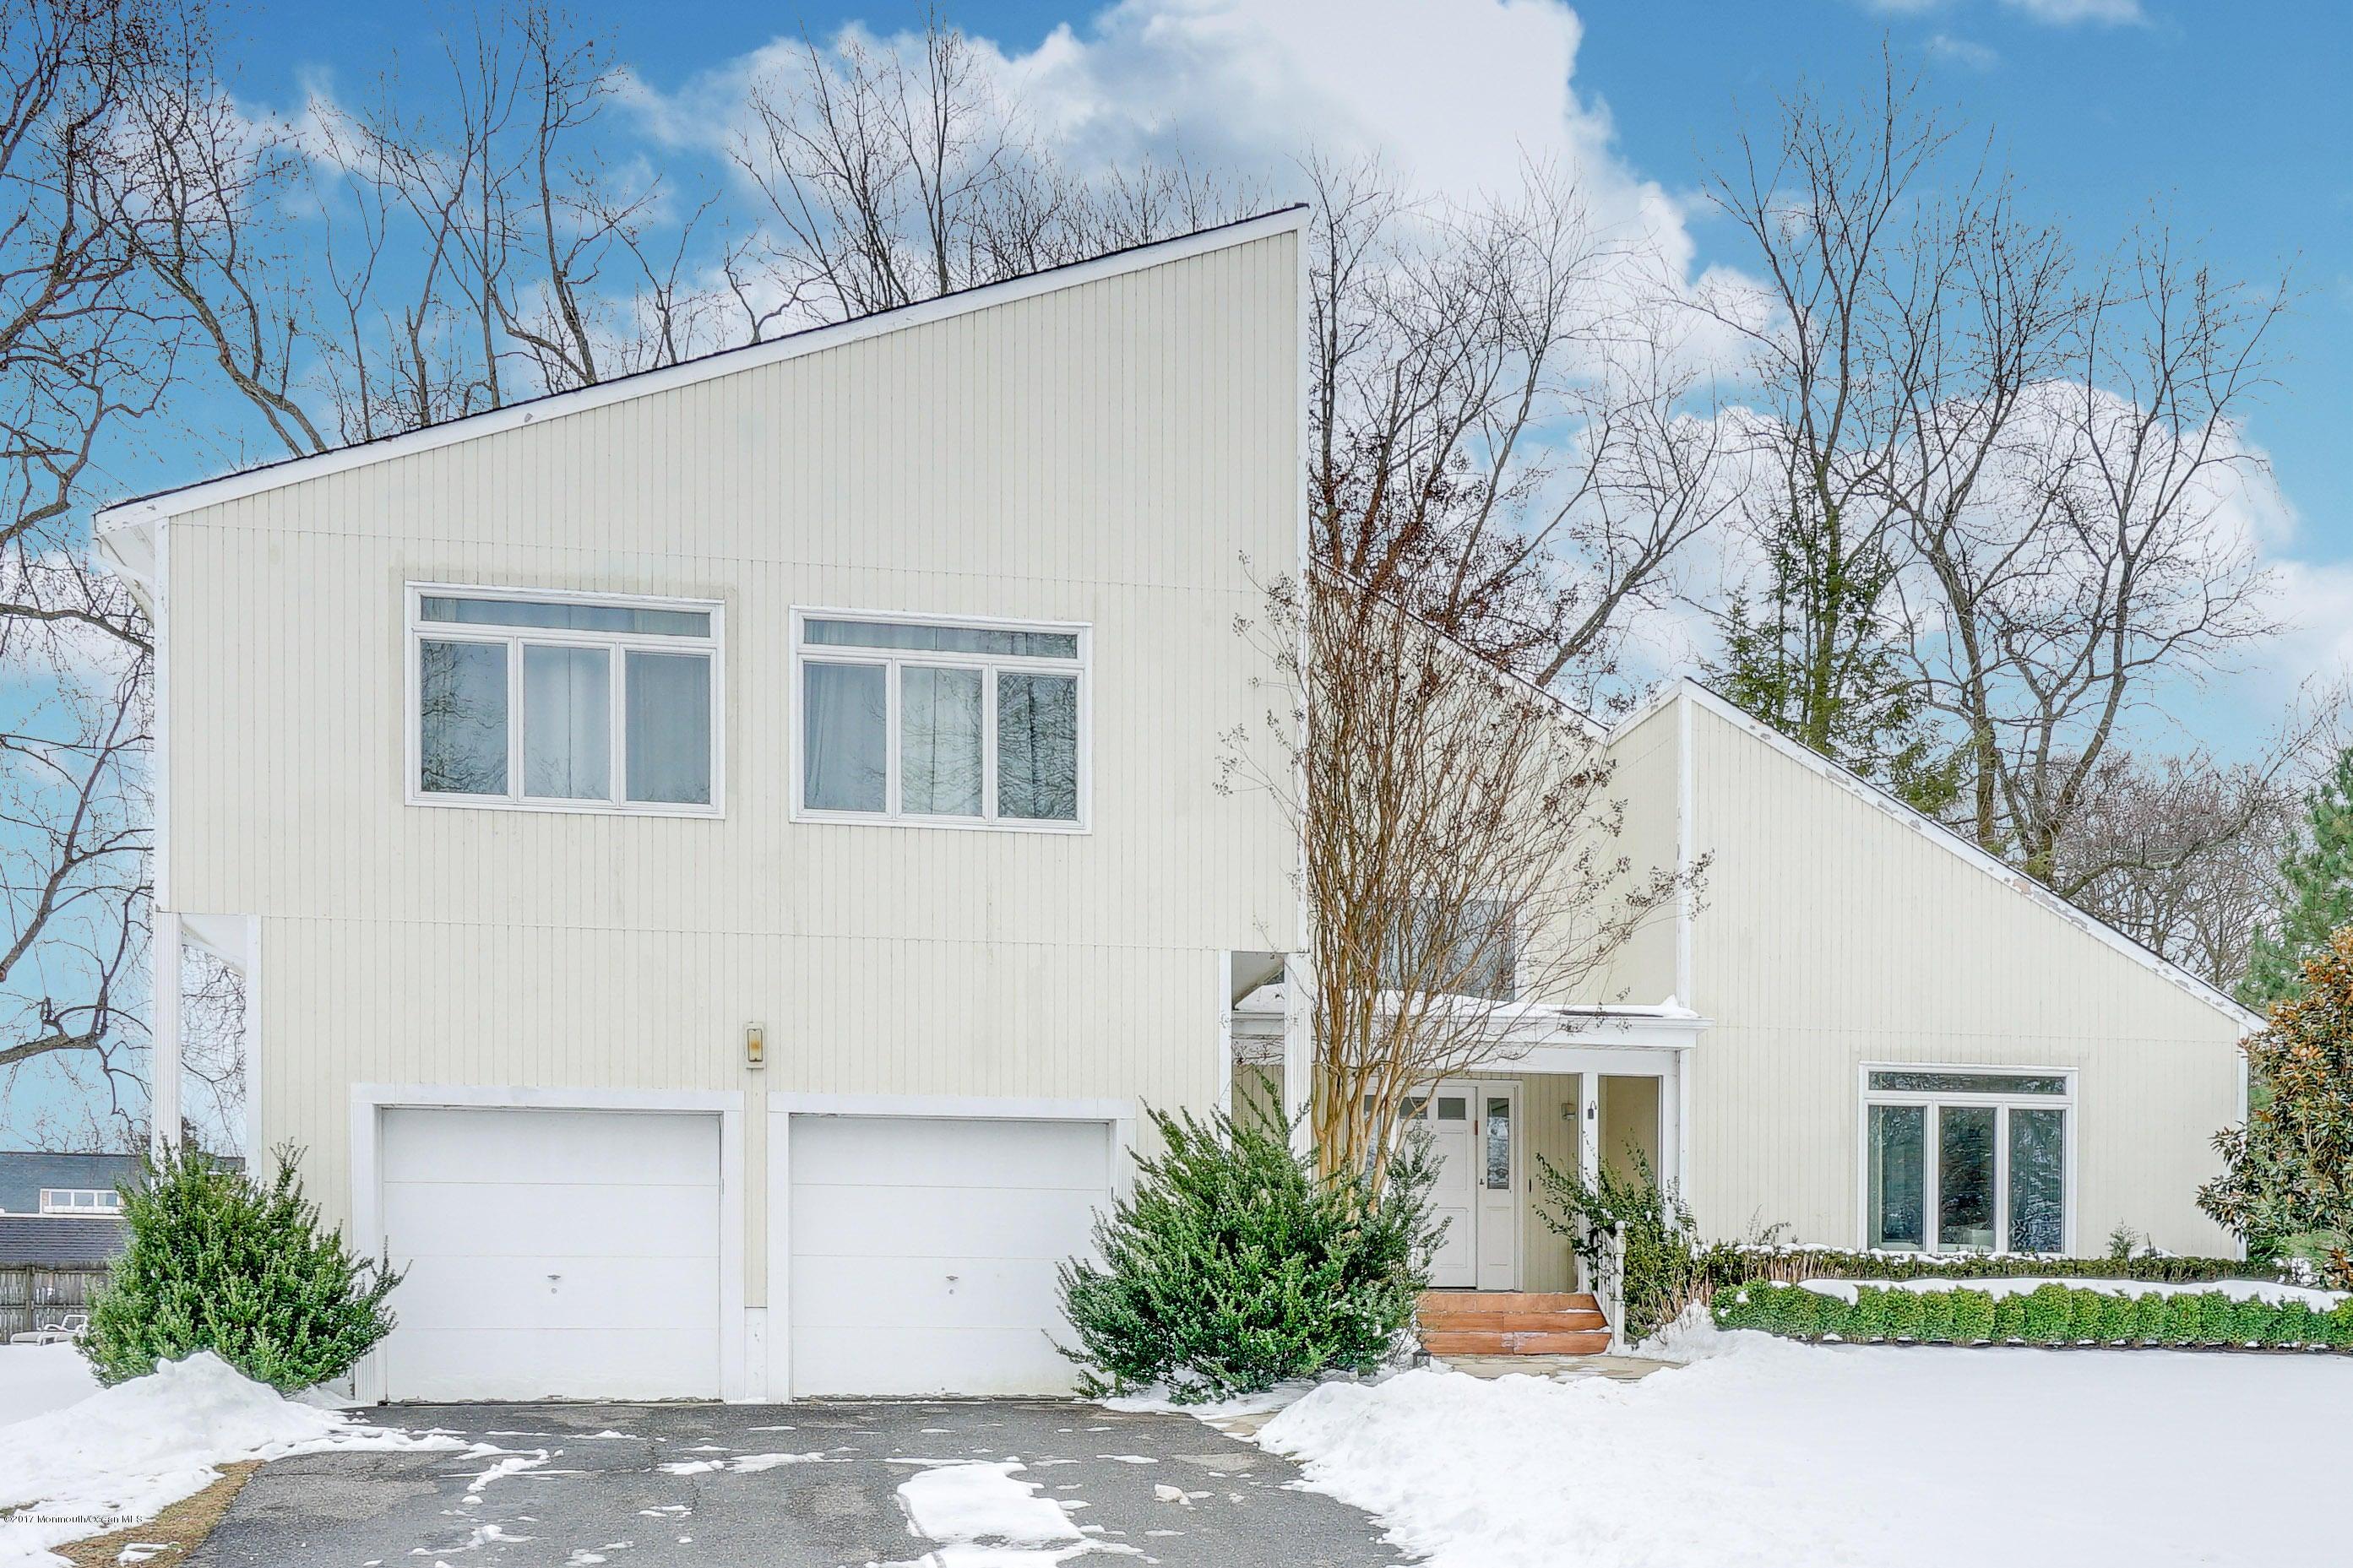 Single Family Home for Sale at 1 Harvard Court Oakhurst, 07755 United States